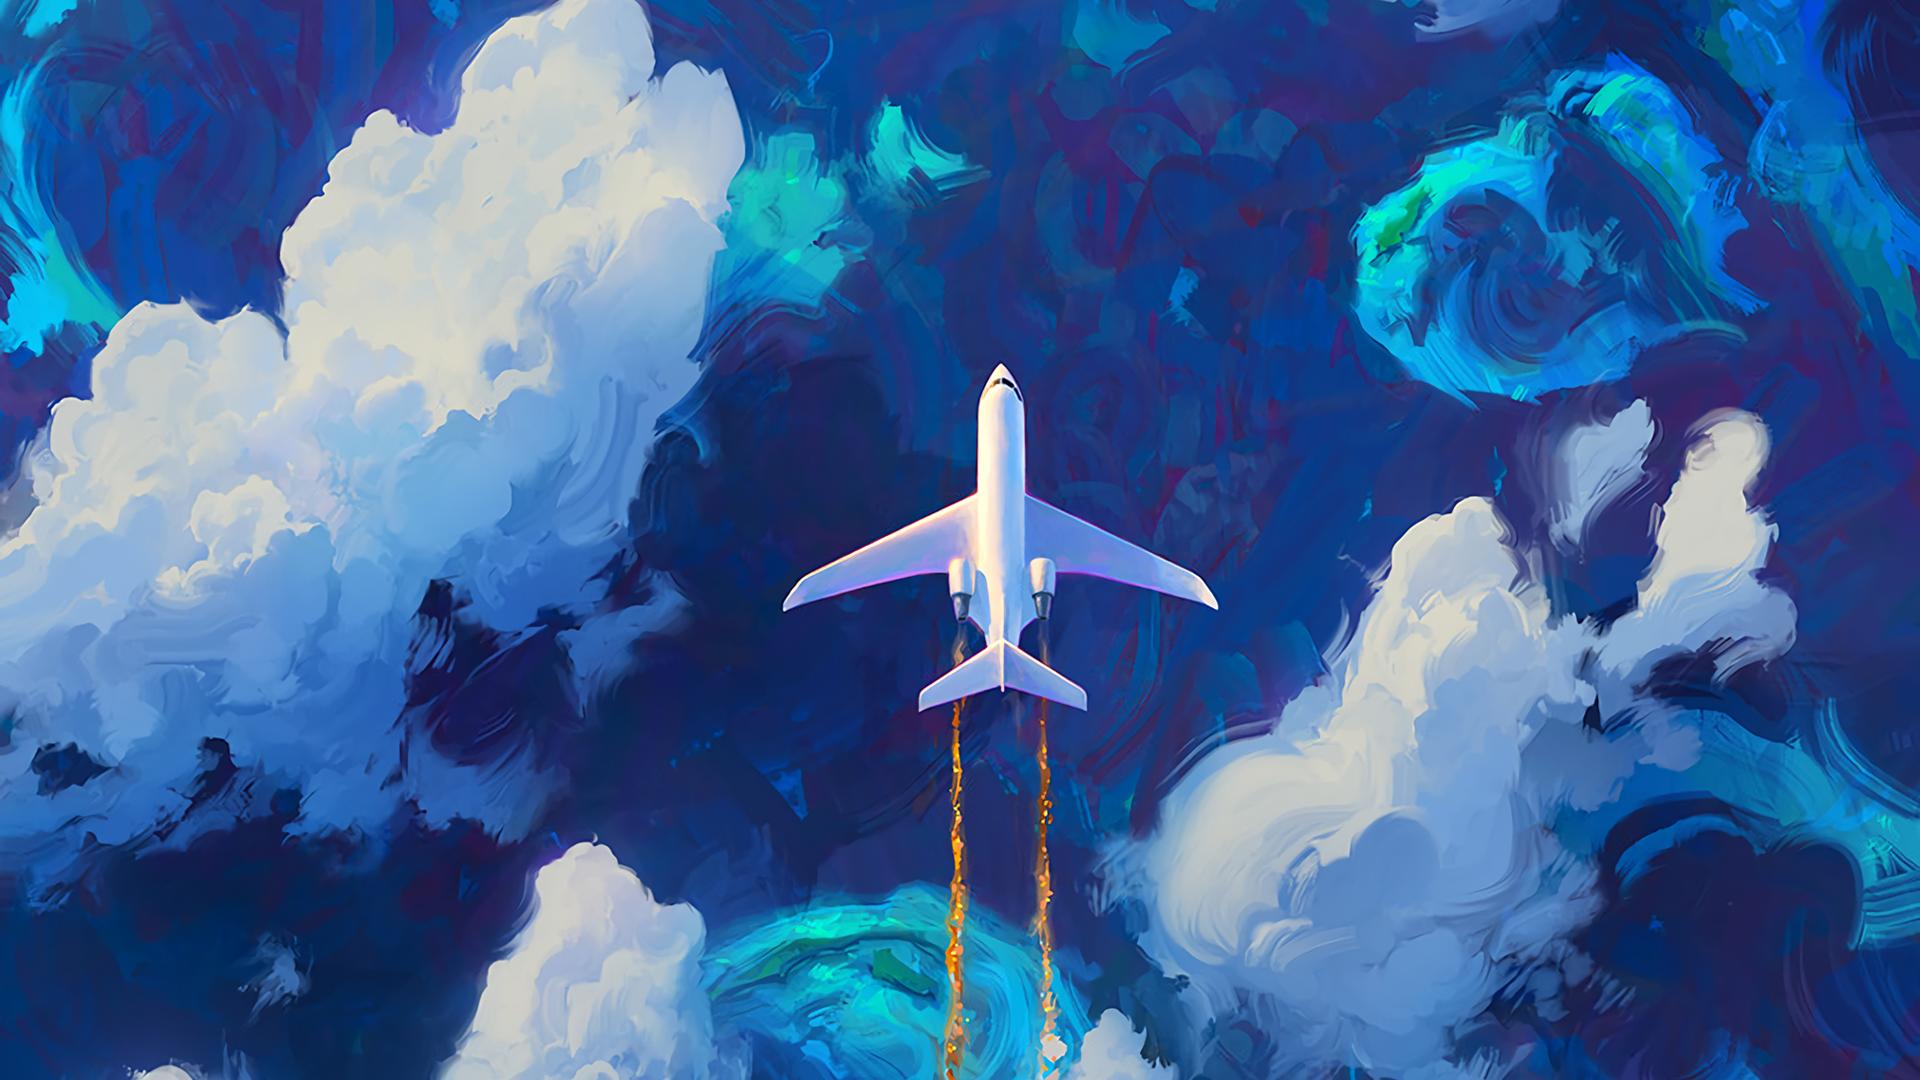 General 1920x1080 Digital Art Planes Clouds Rhads Blue Art Wallpaper Plane Drawing Computer Wallpaper Desktop Wallpapers